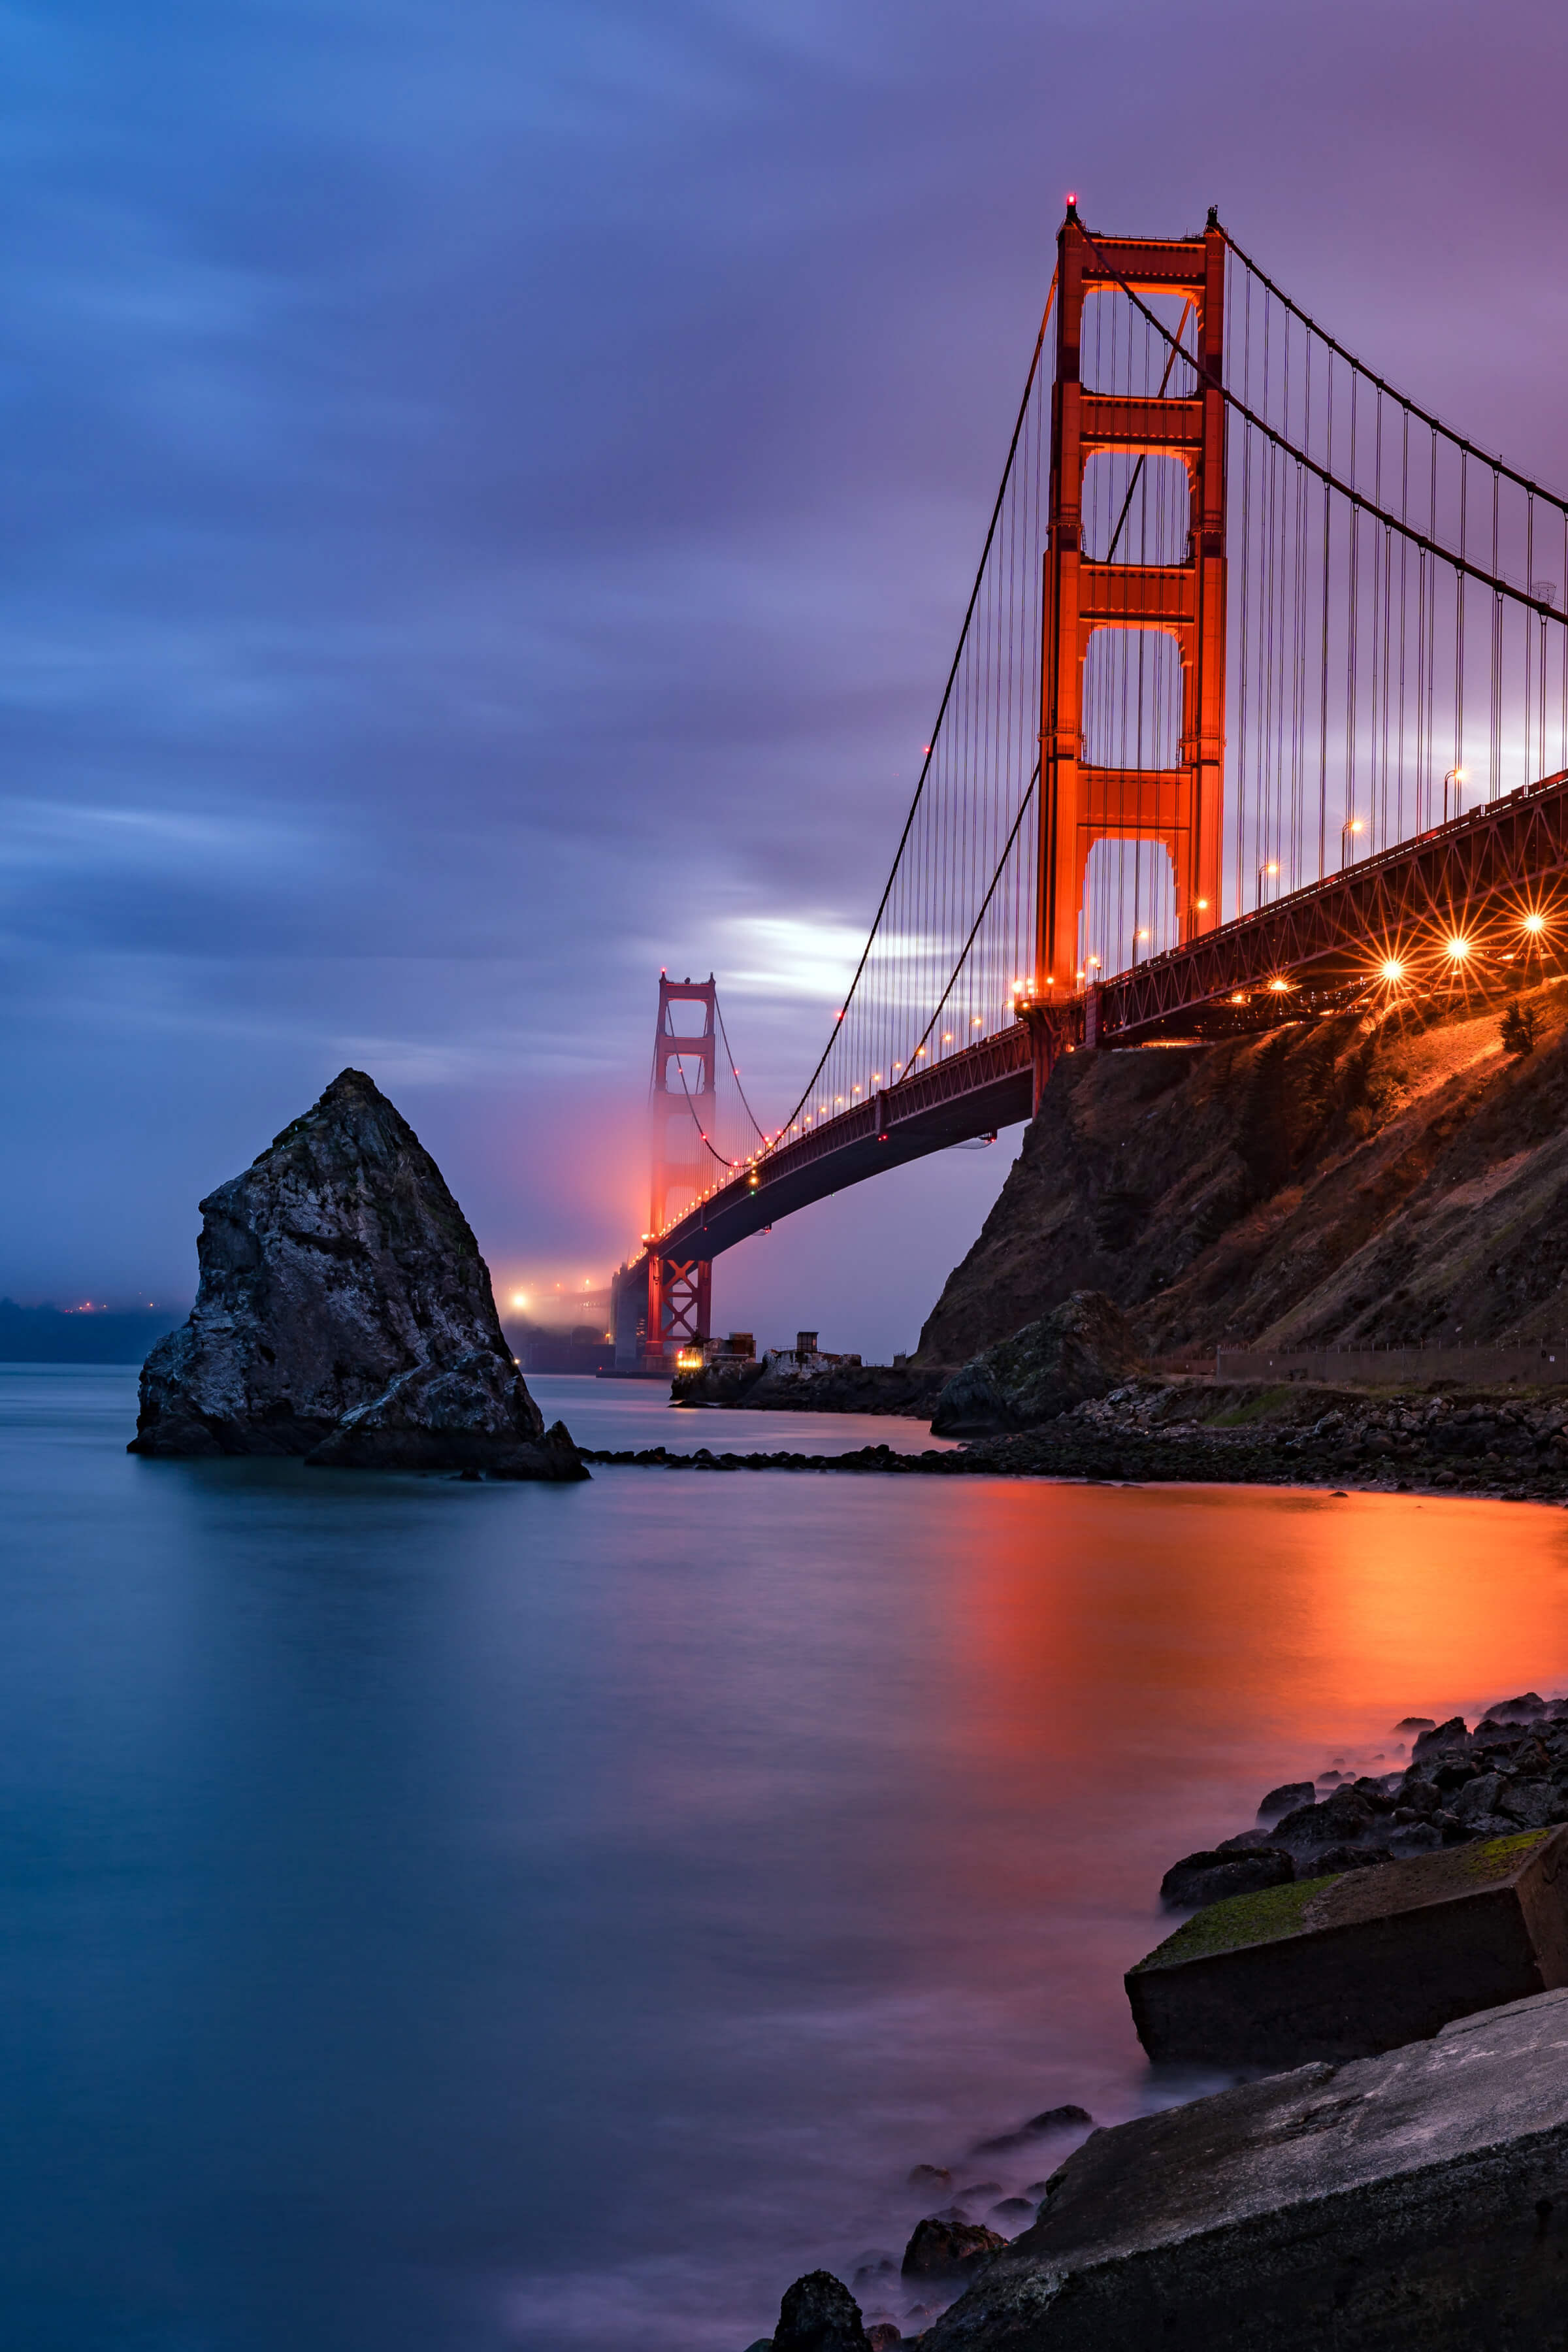 Long Bridge Lights